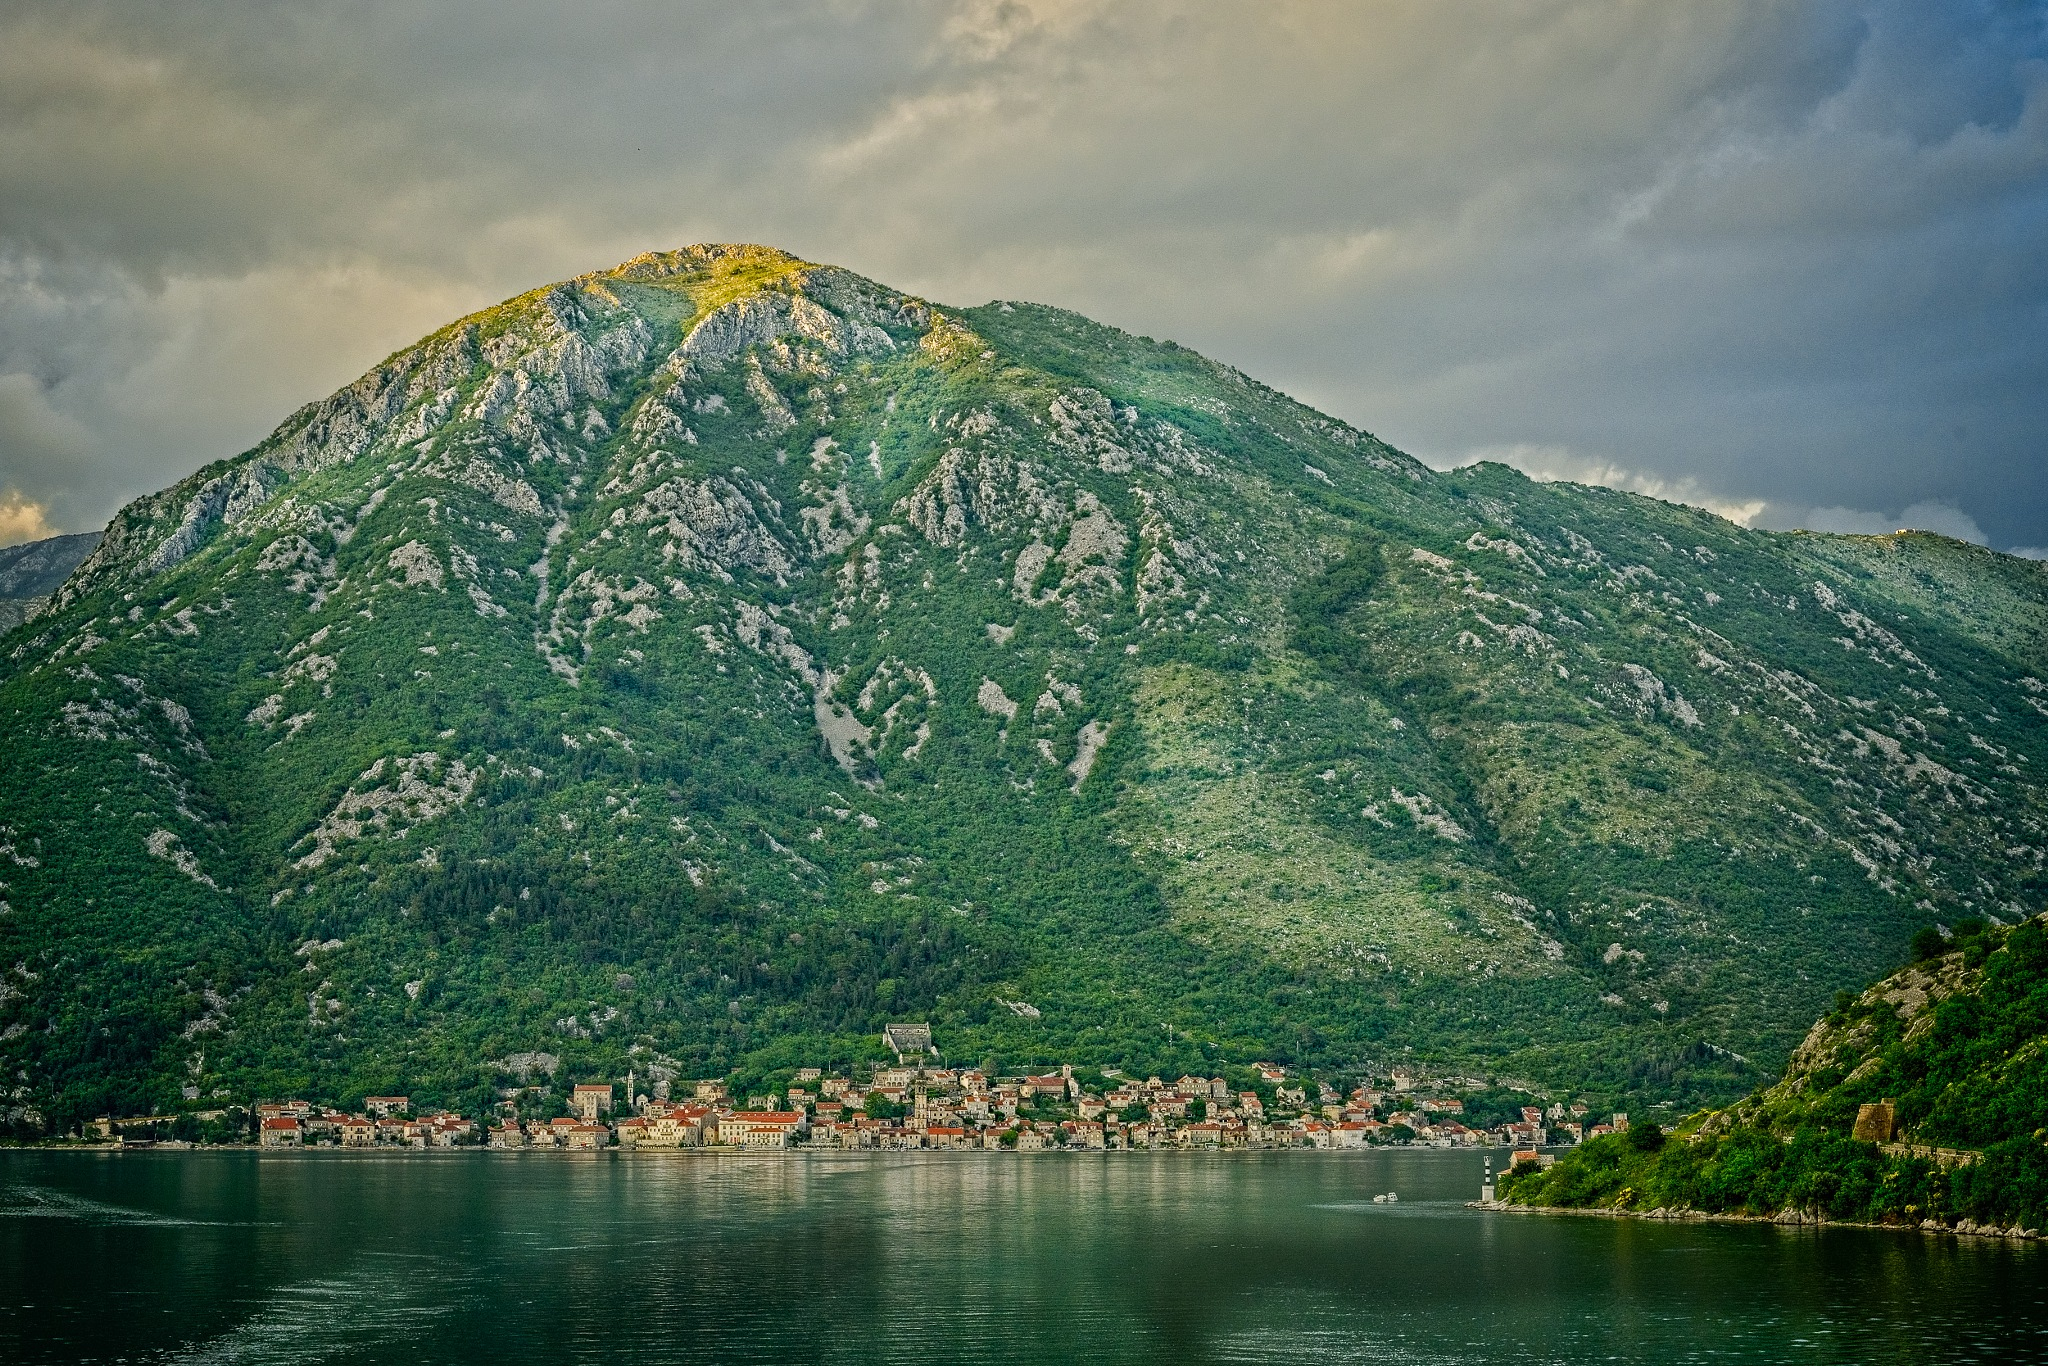 Kotor, Montenegro by Steve Director